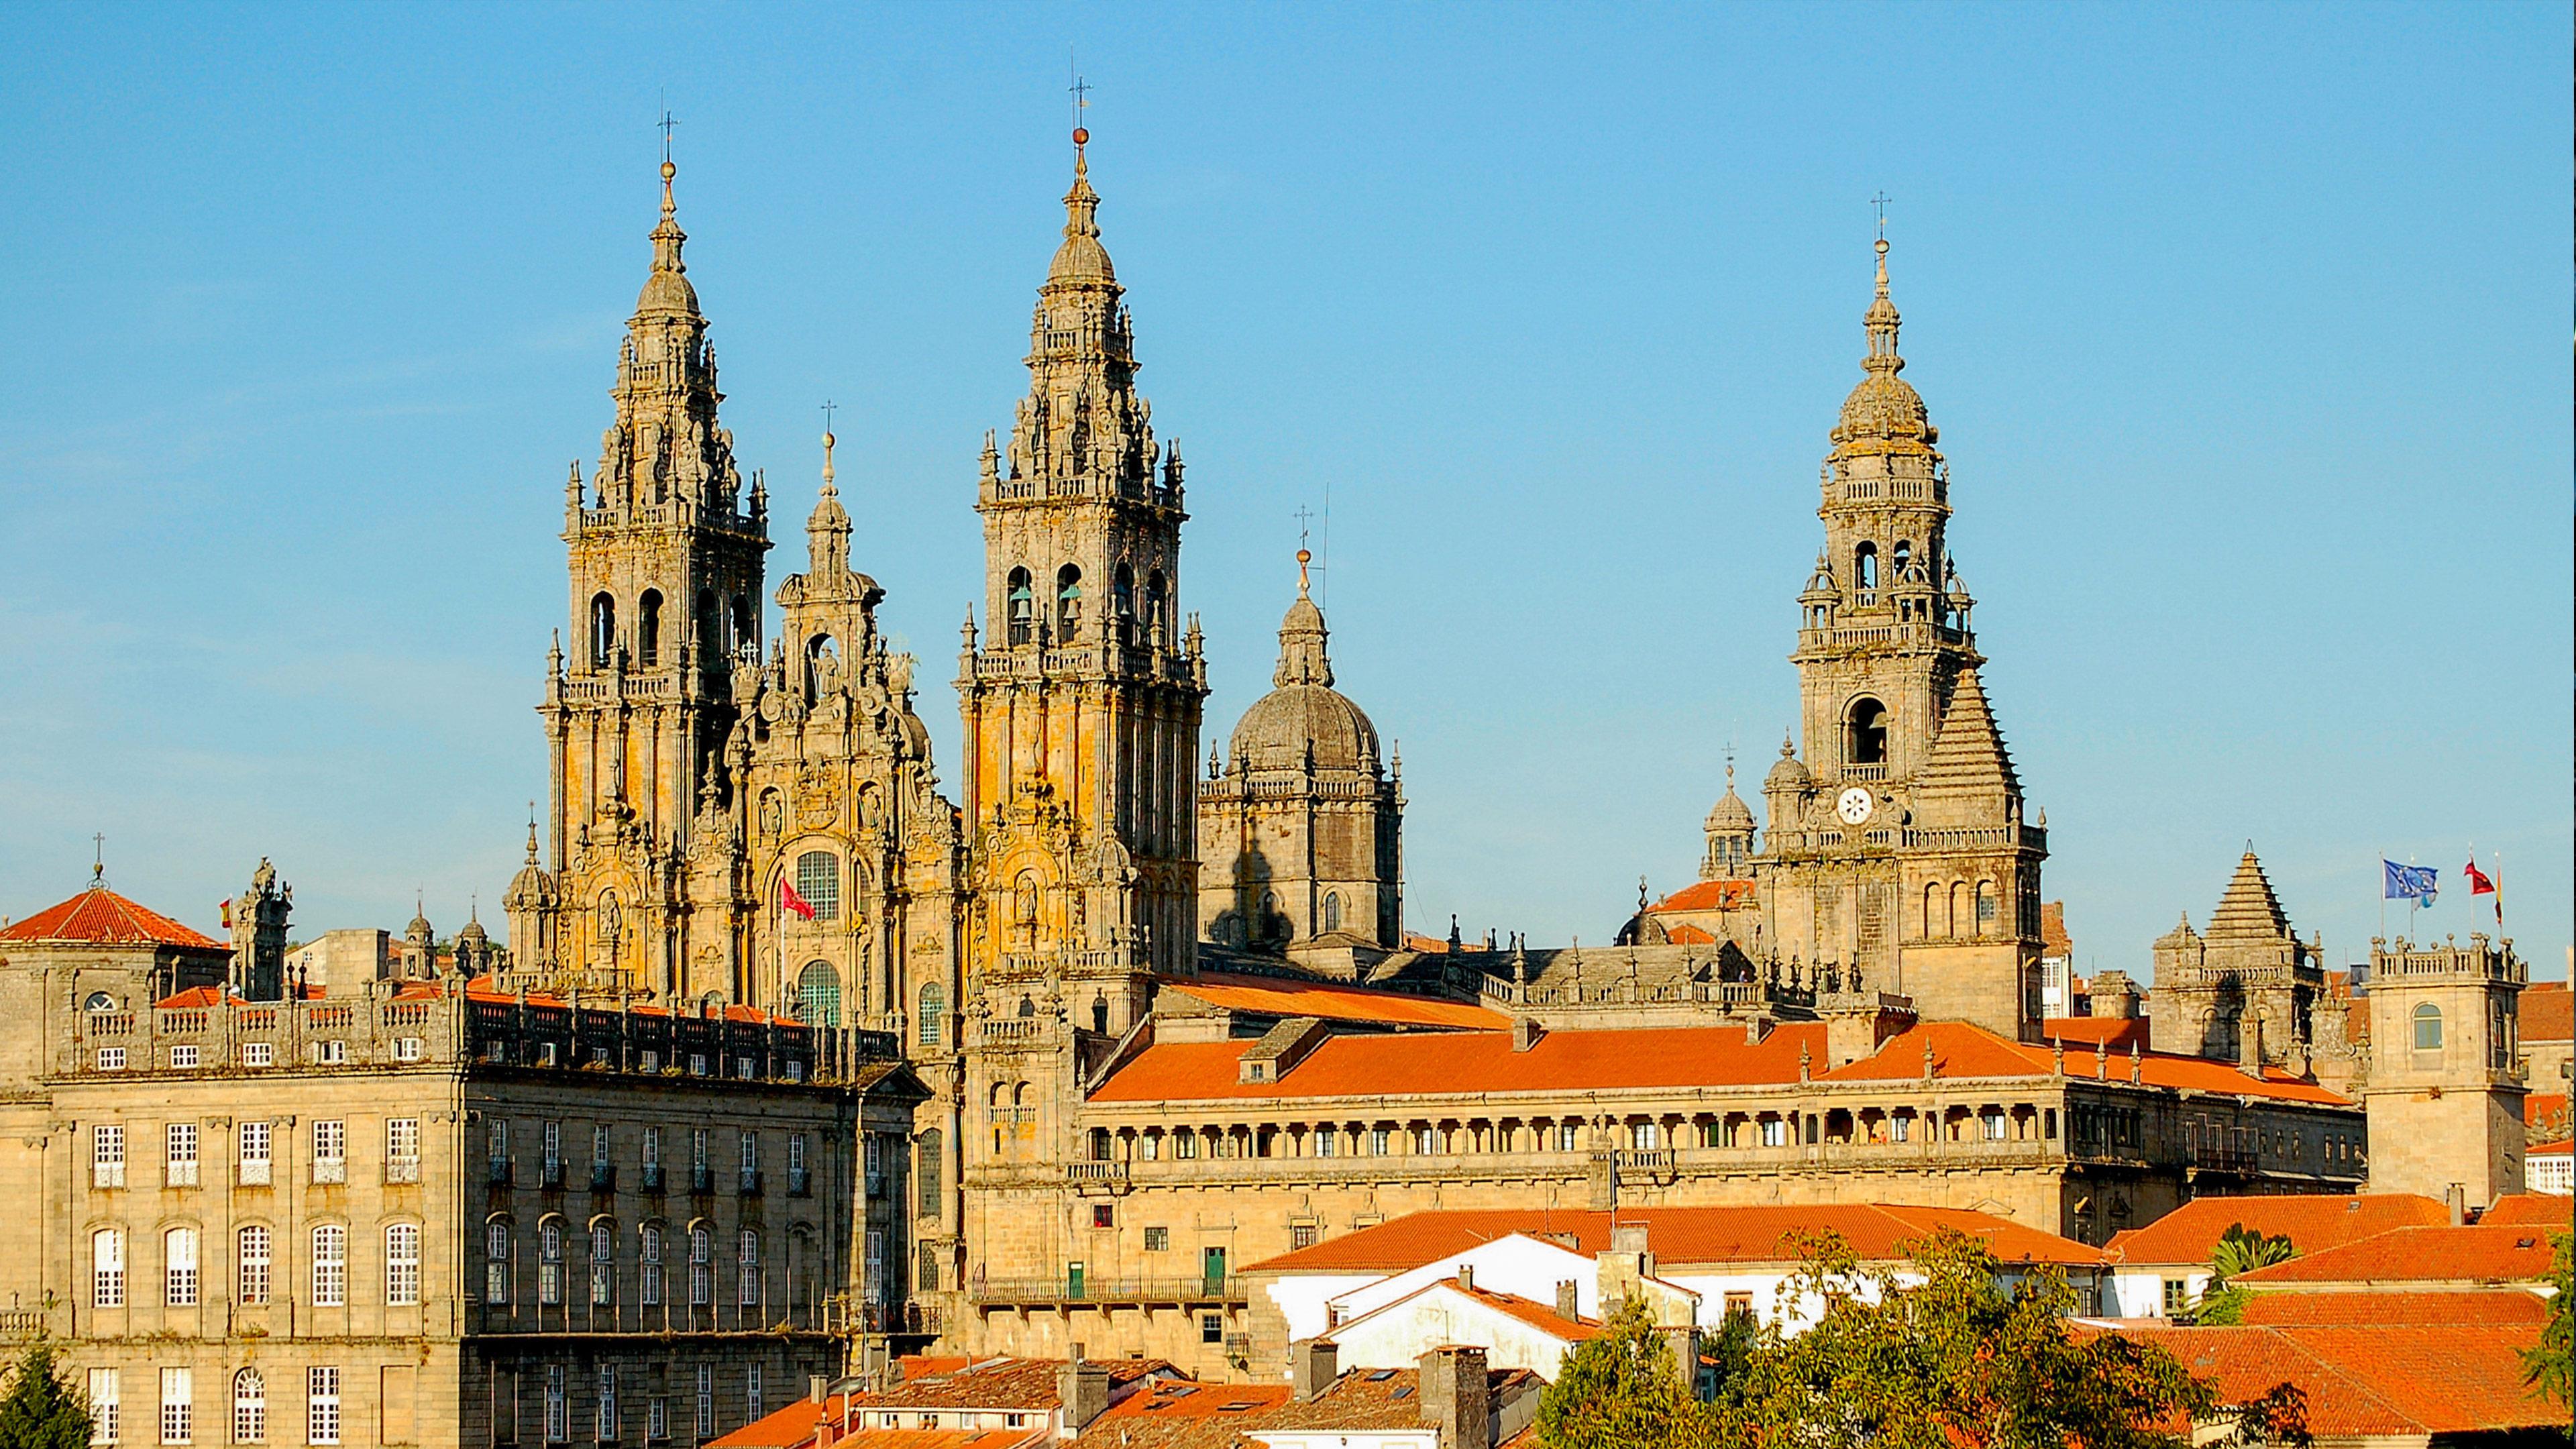 4 June 2014 - 6 June 2014 Santiago de Compostela Spain